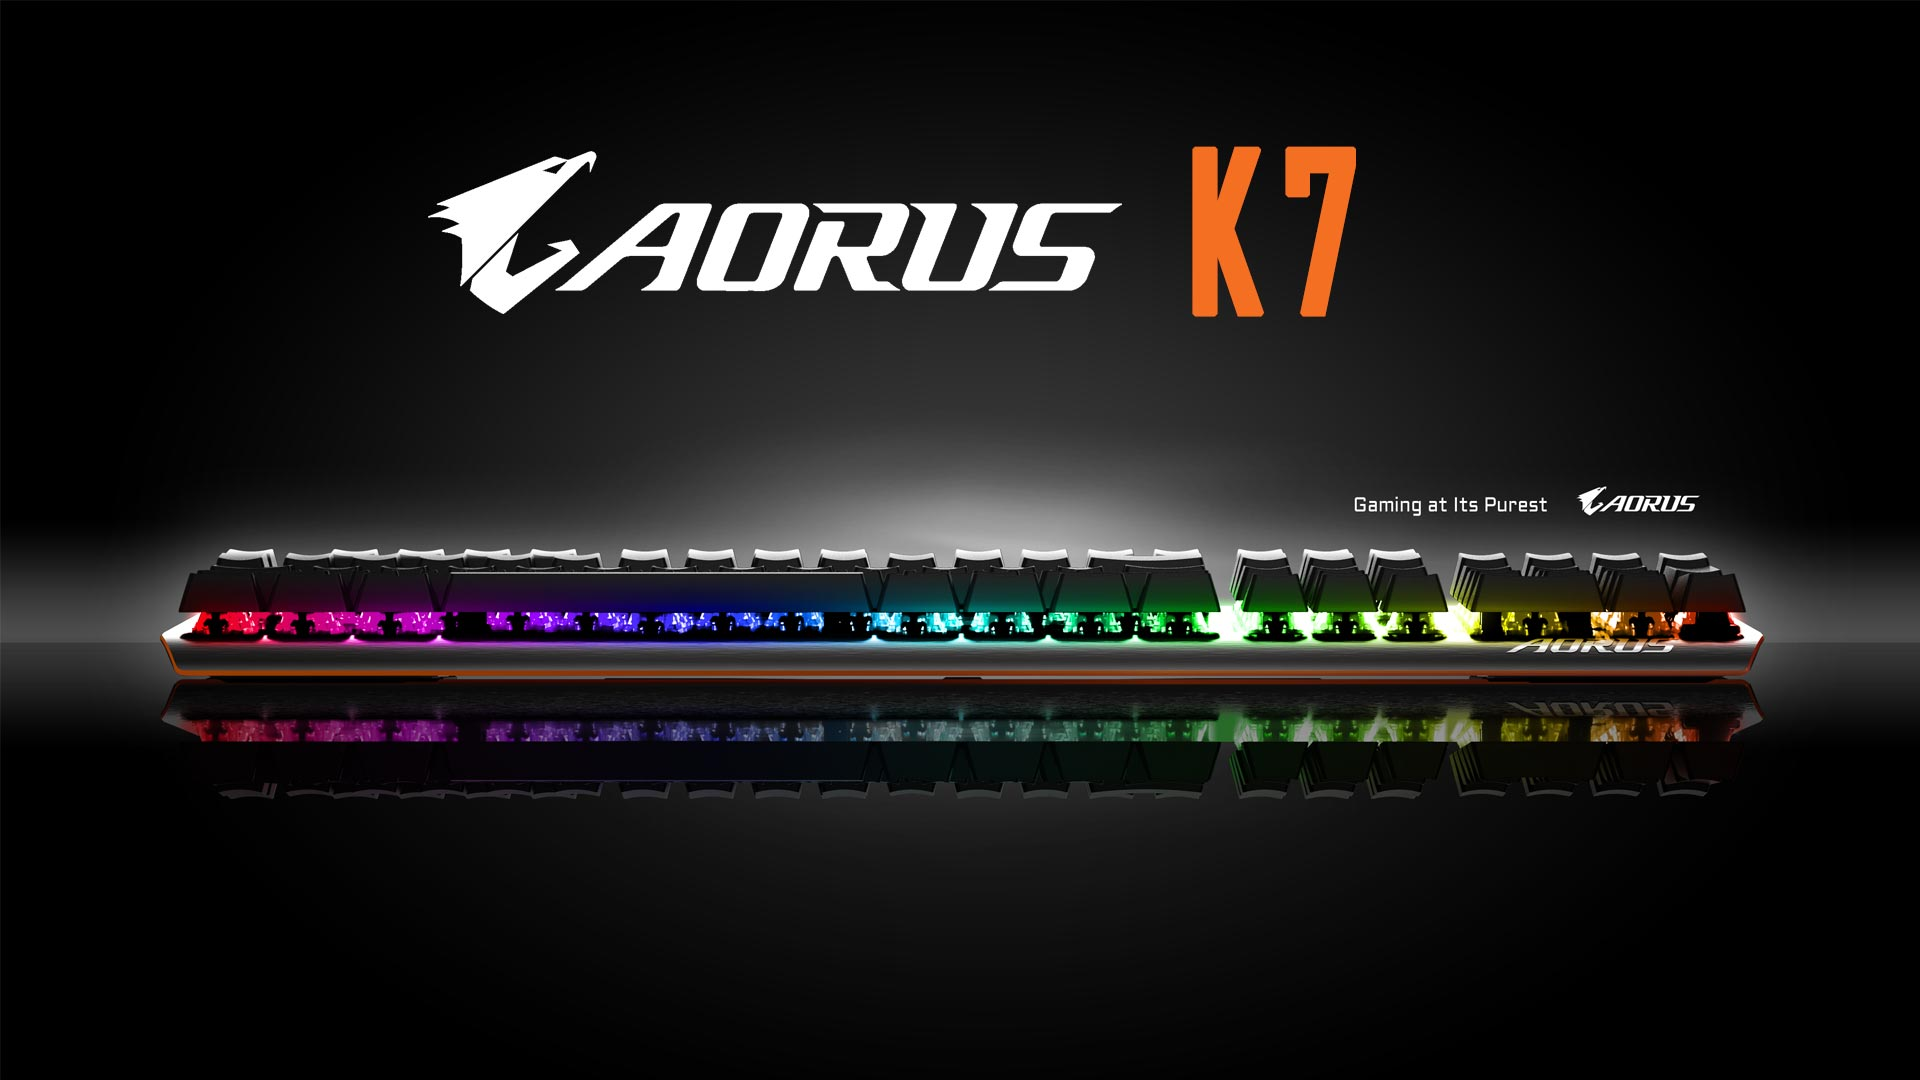 Aorus k7 recensione